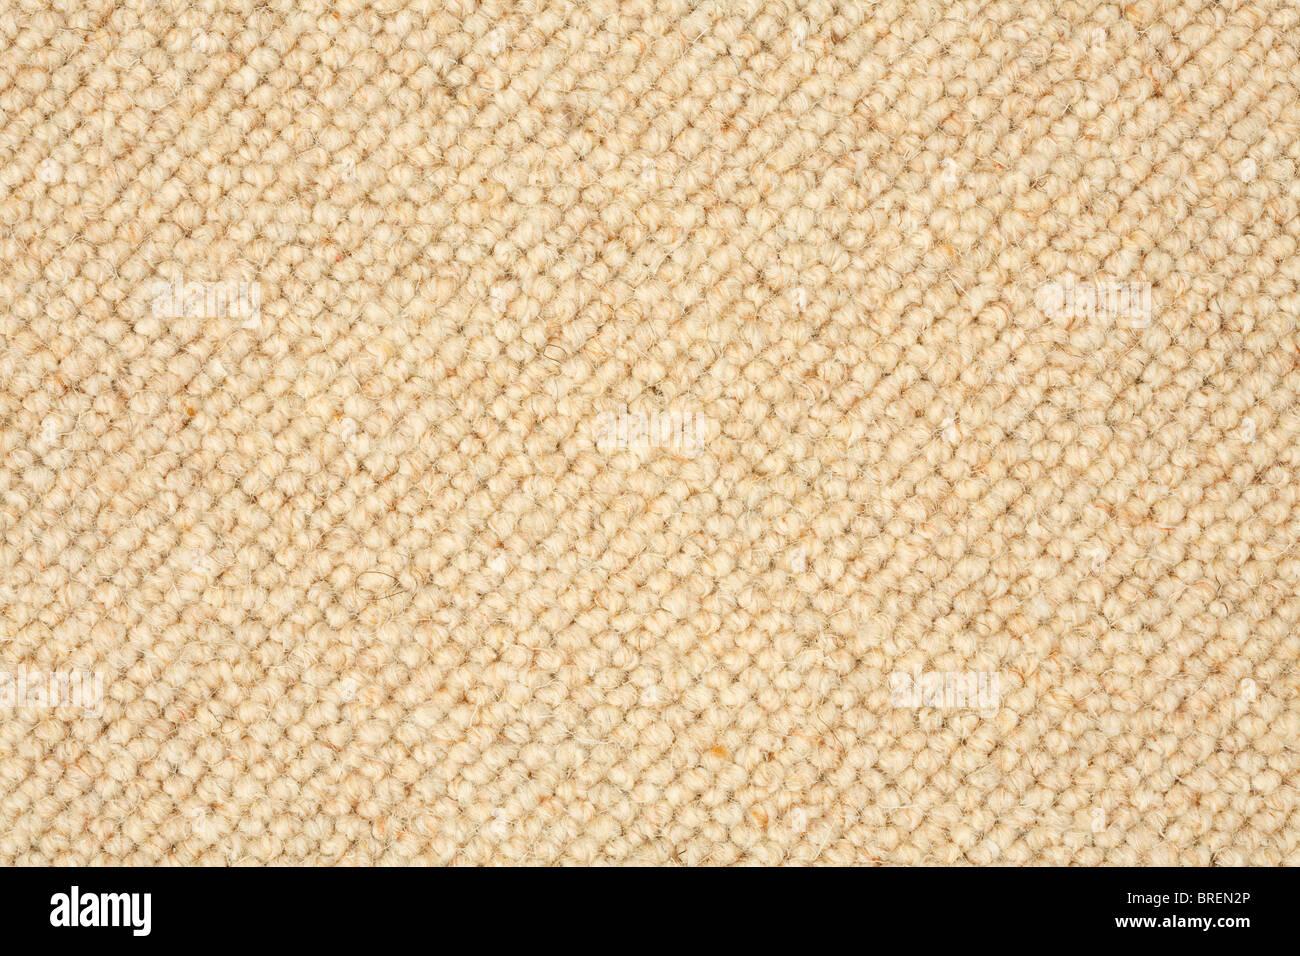 Brown Carpet Texture Pattern